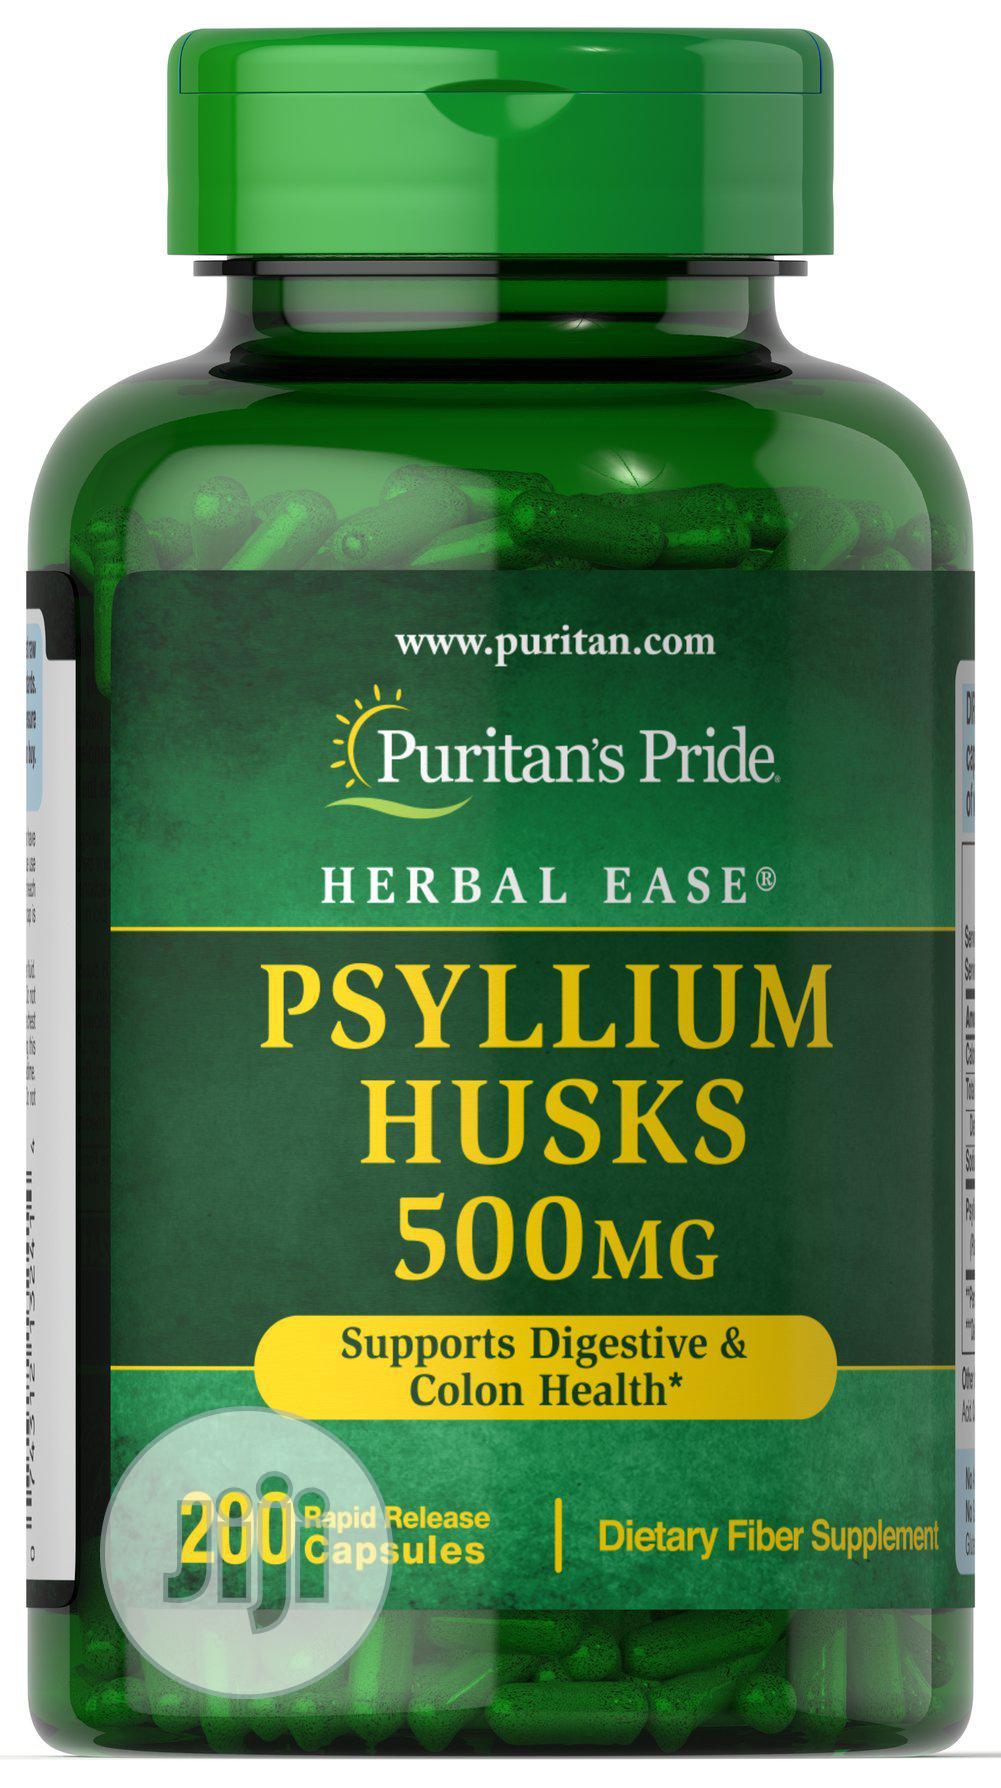 Psyllium Husks 500 Mg -To Relieve Constipation Diarrhea